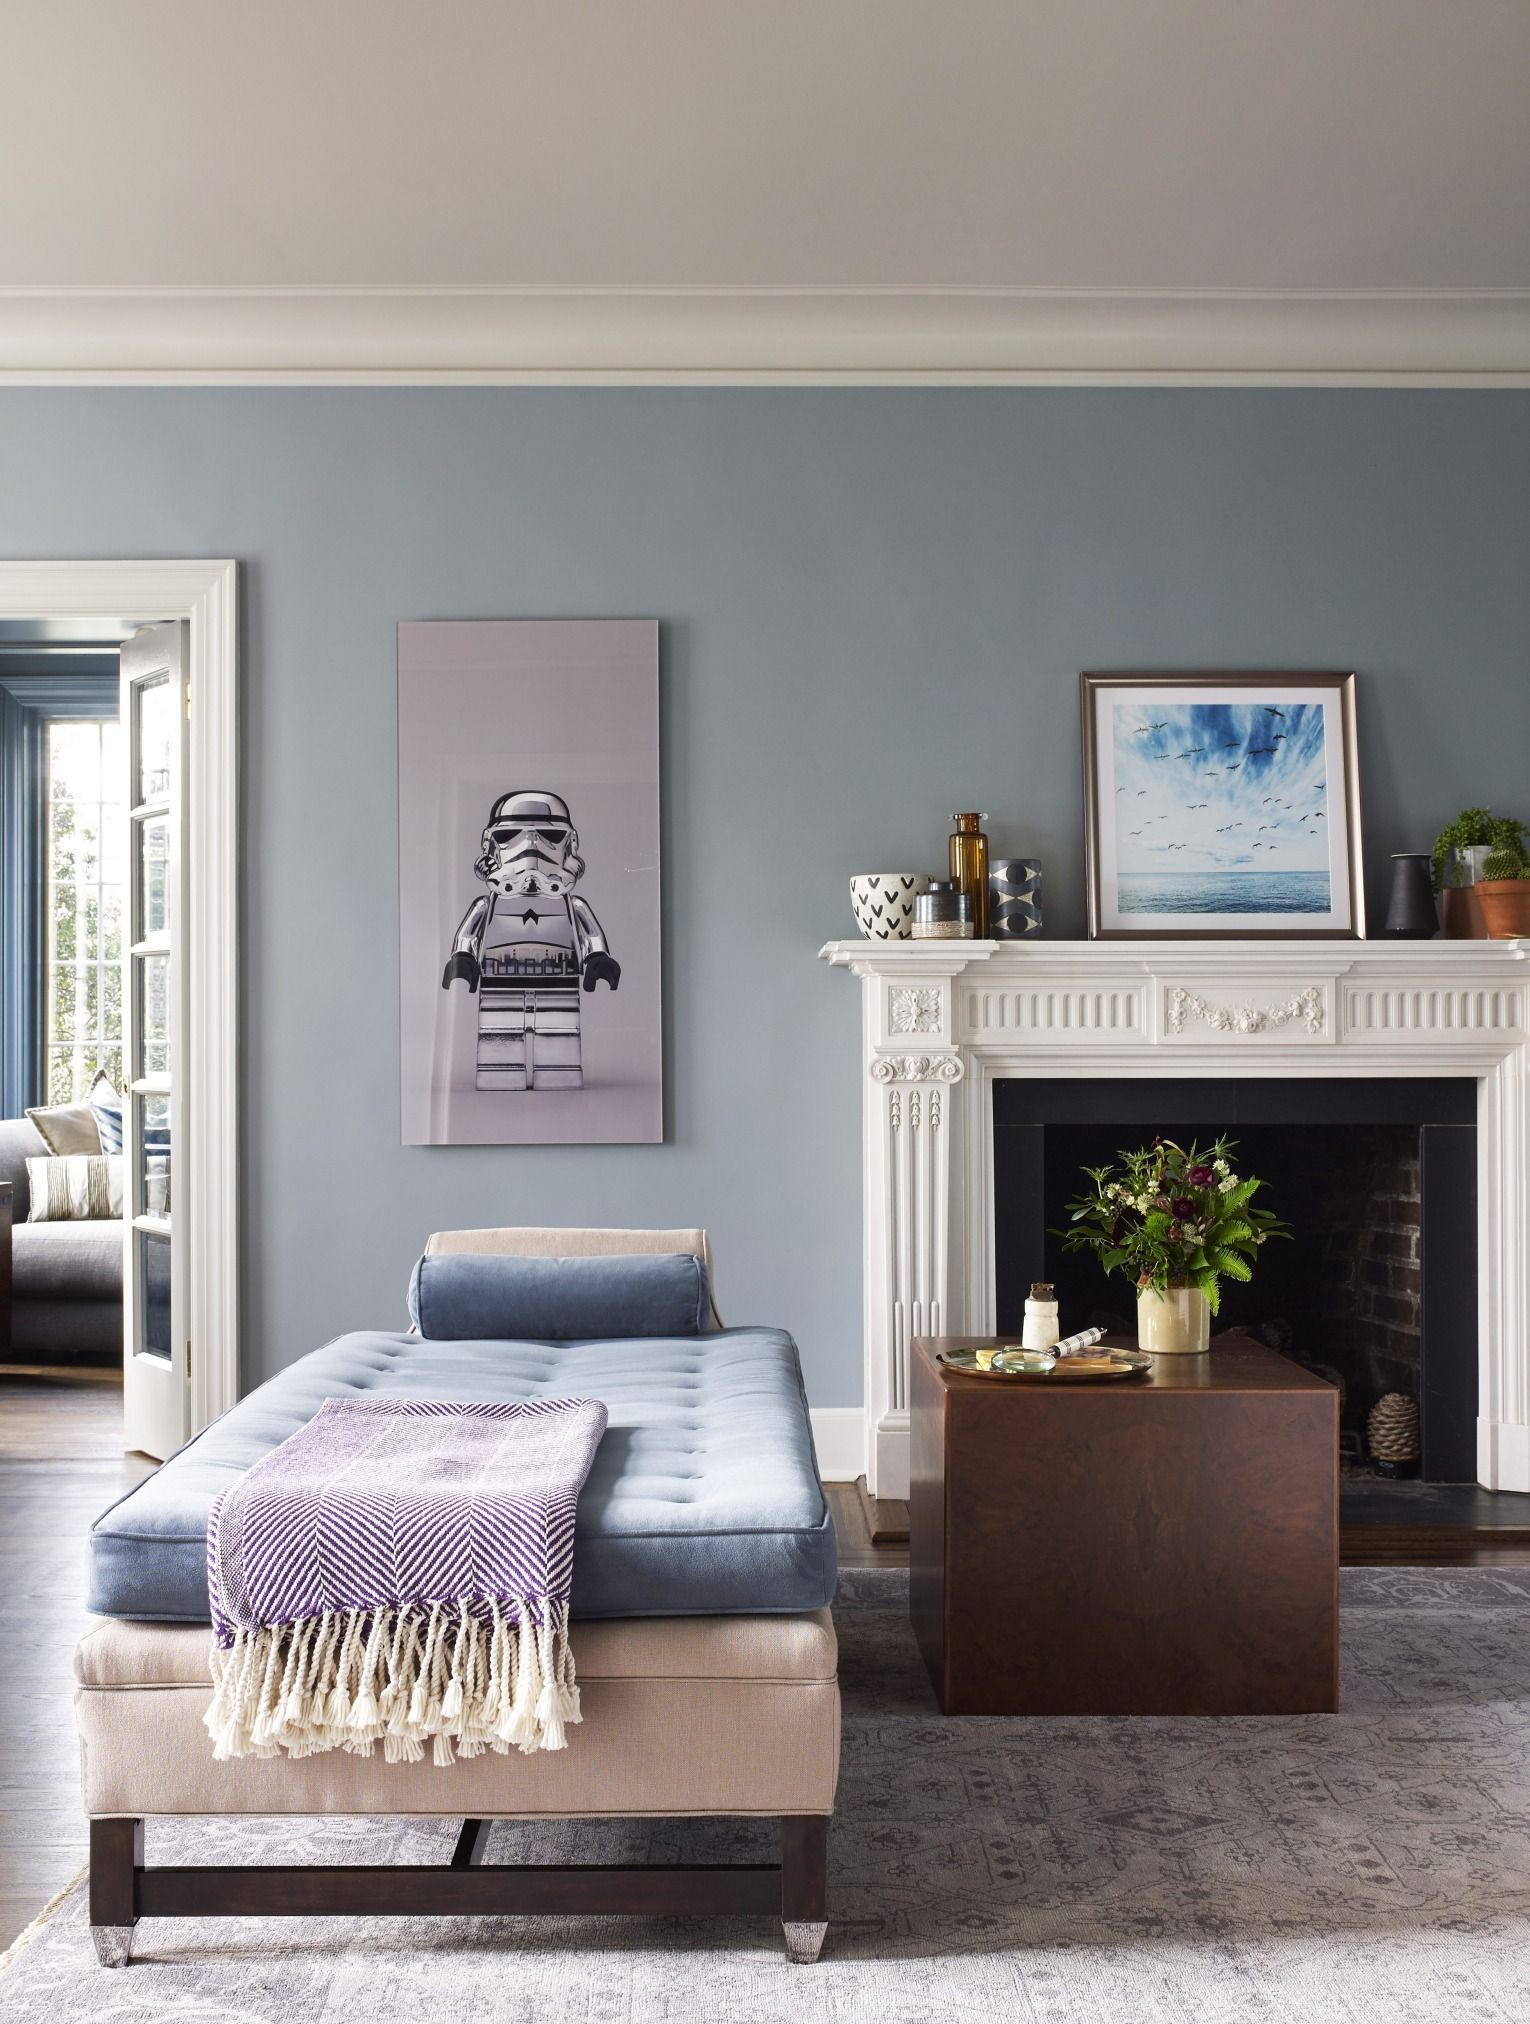 Innenarchitektur wohnzimmer lila a classic yet edgy georgian home in westchester new york  inside